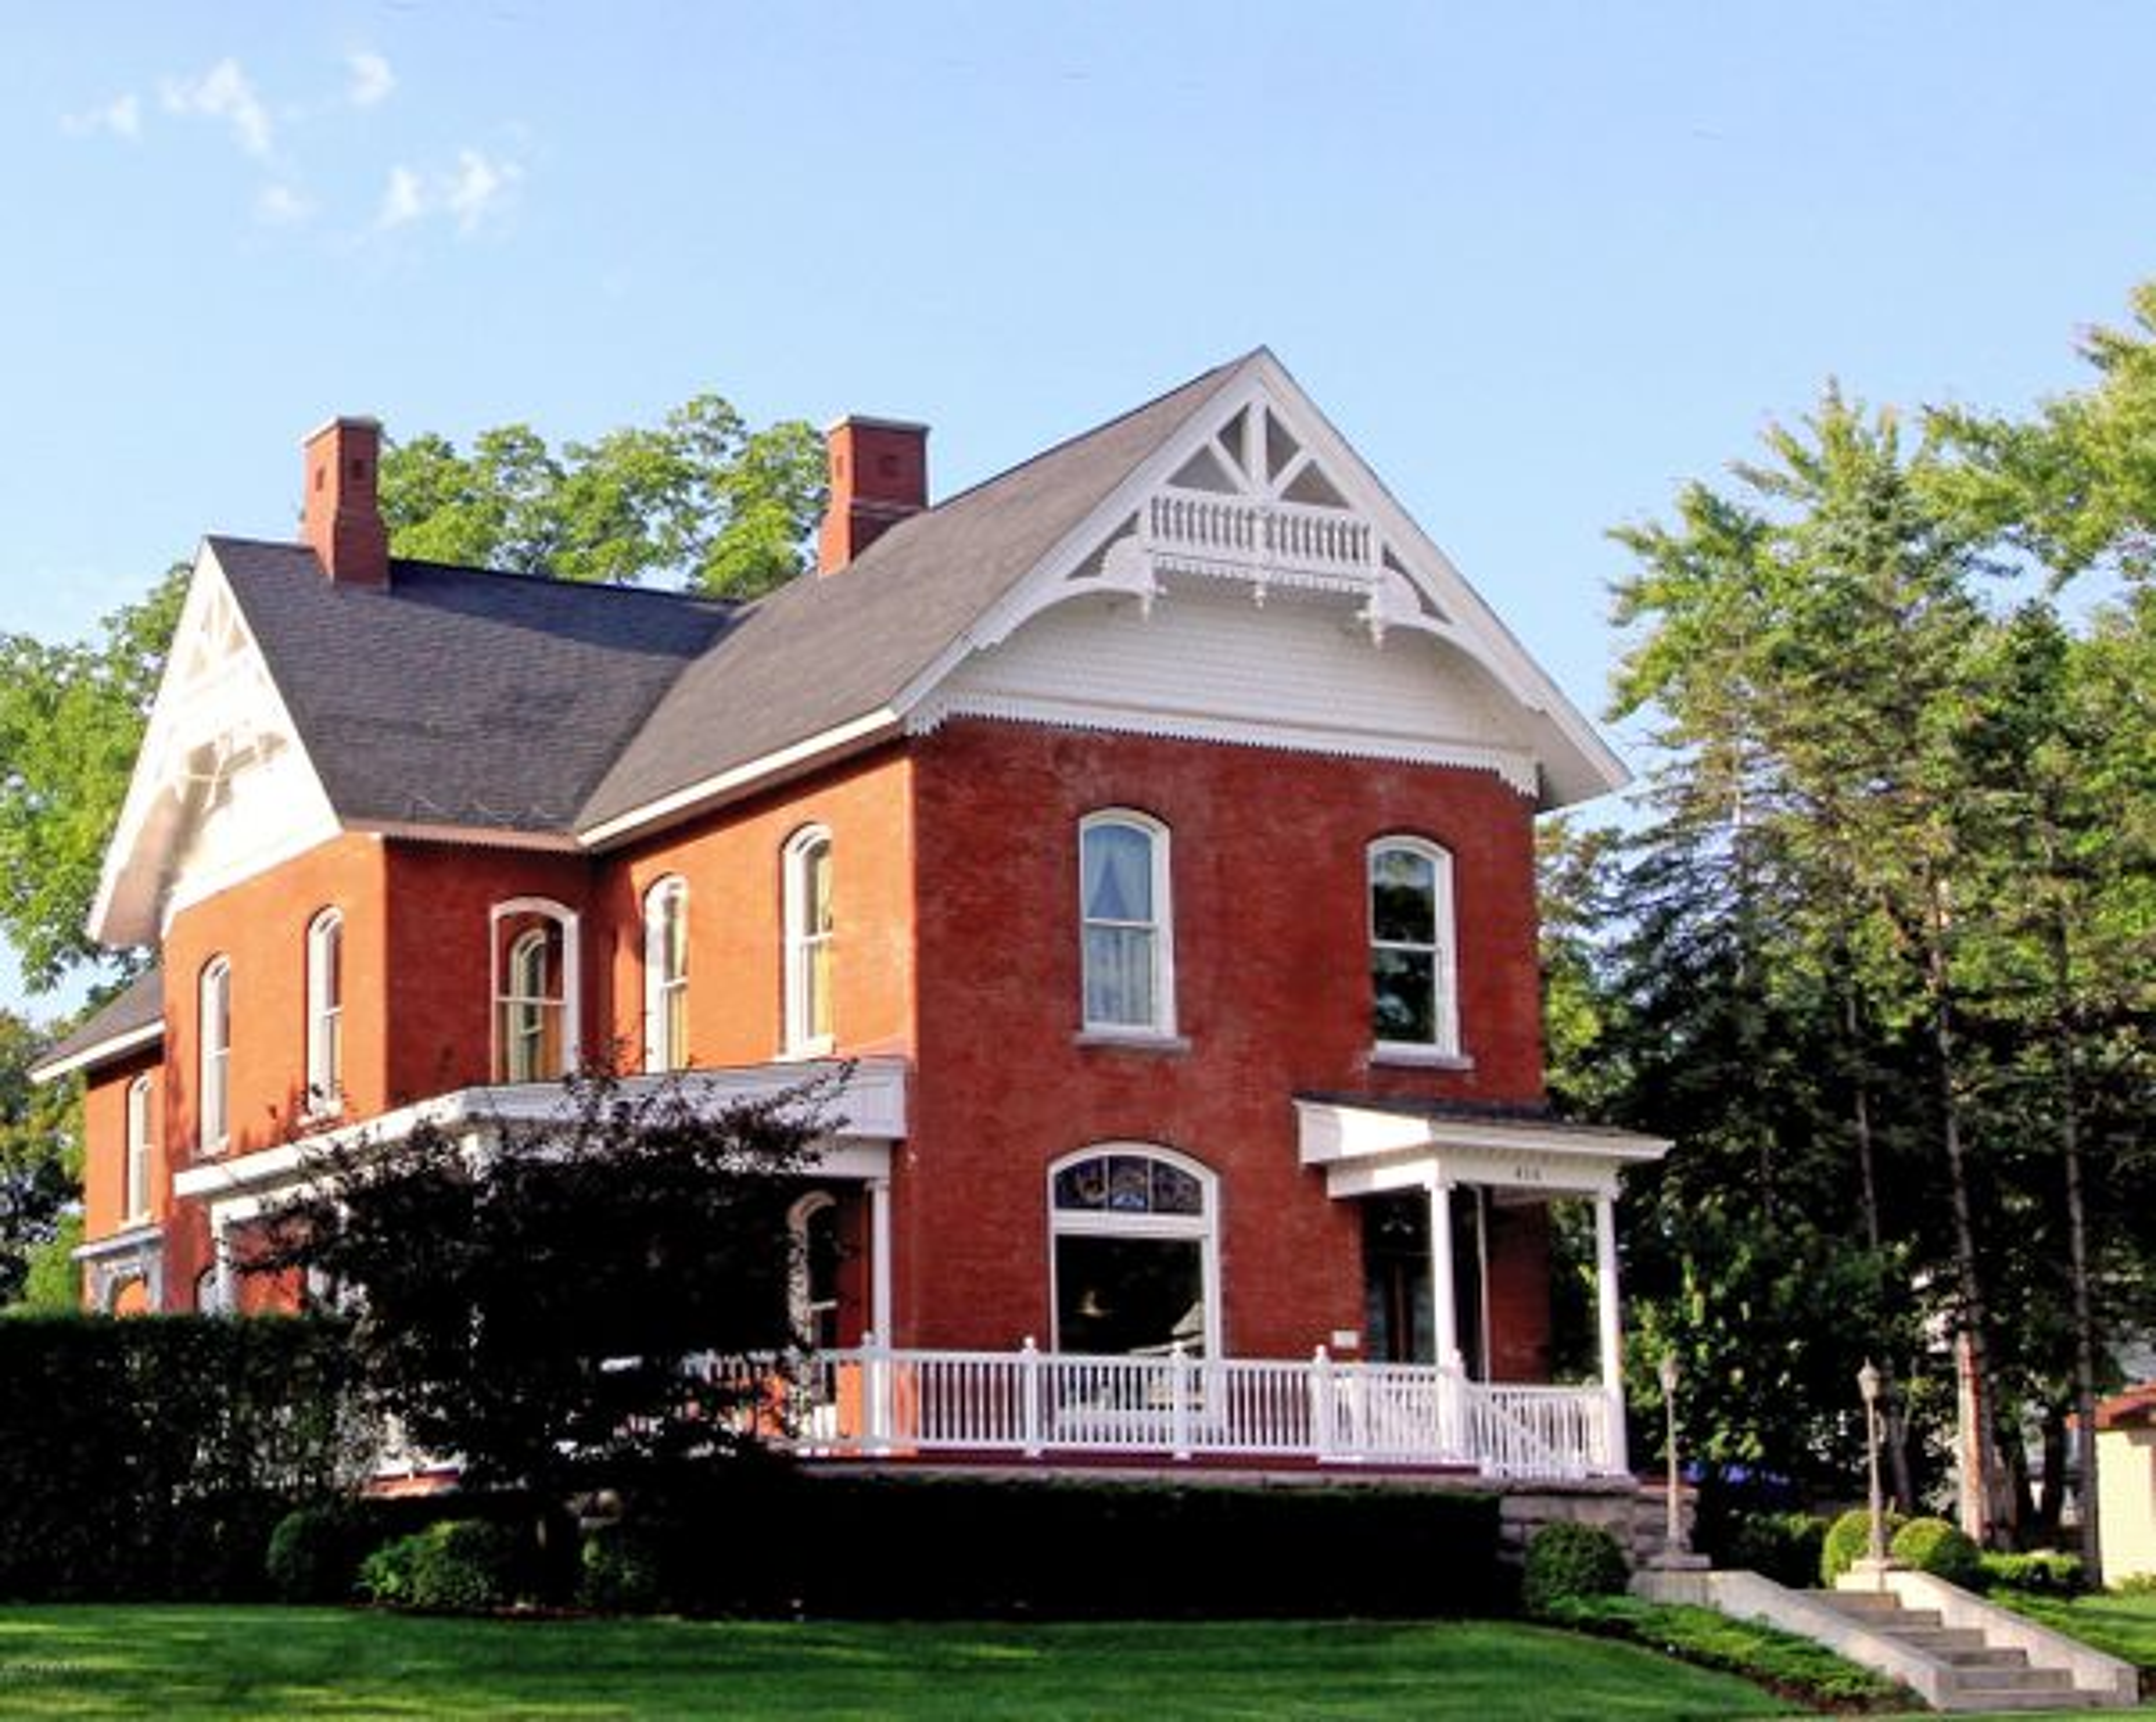 414 Maple Street, Big Rapids, MI 49307